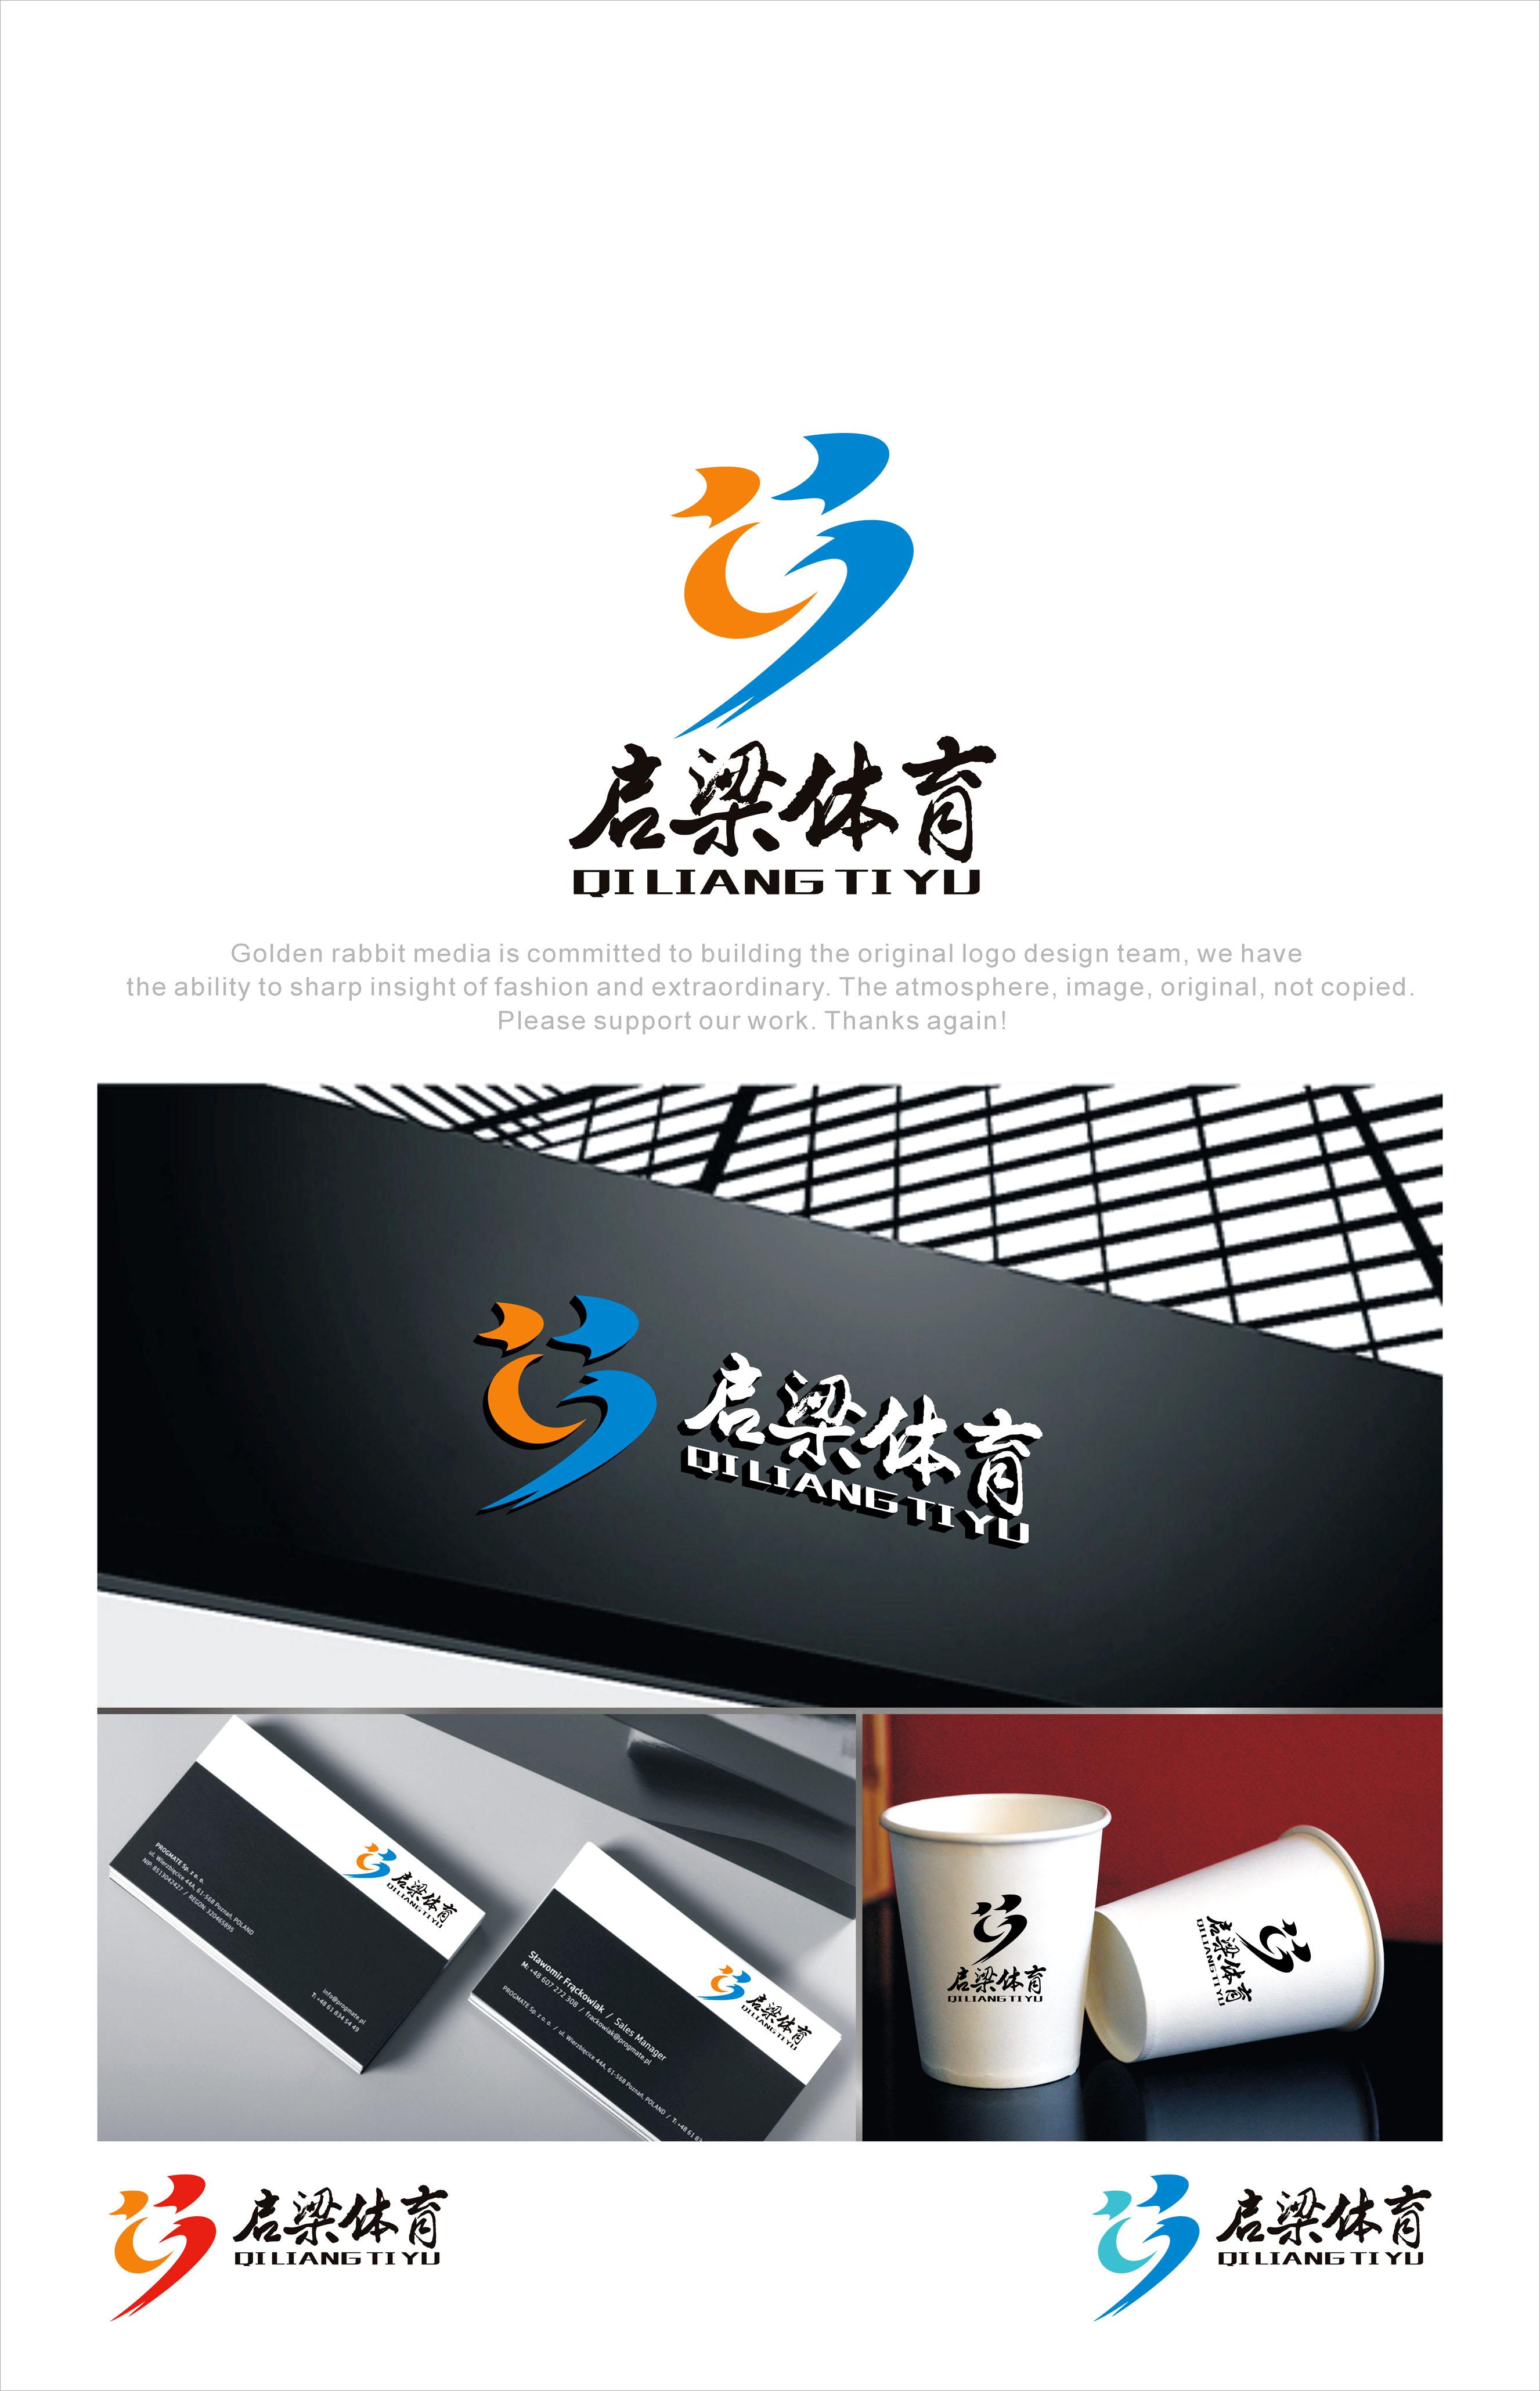 ql电路板公司图标